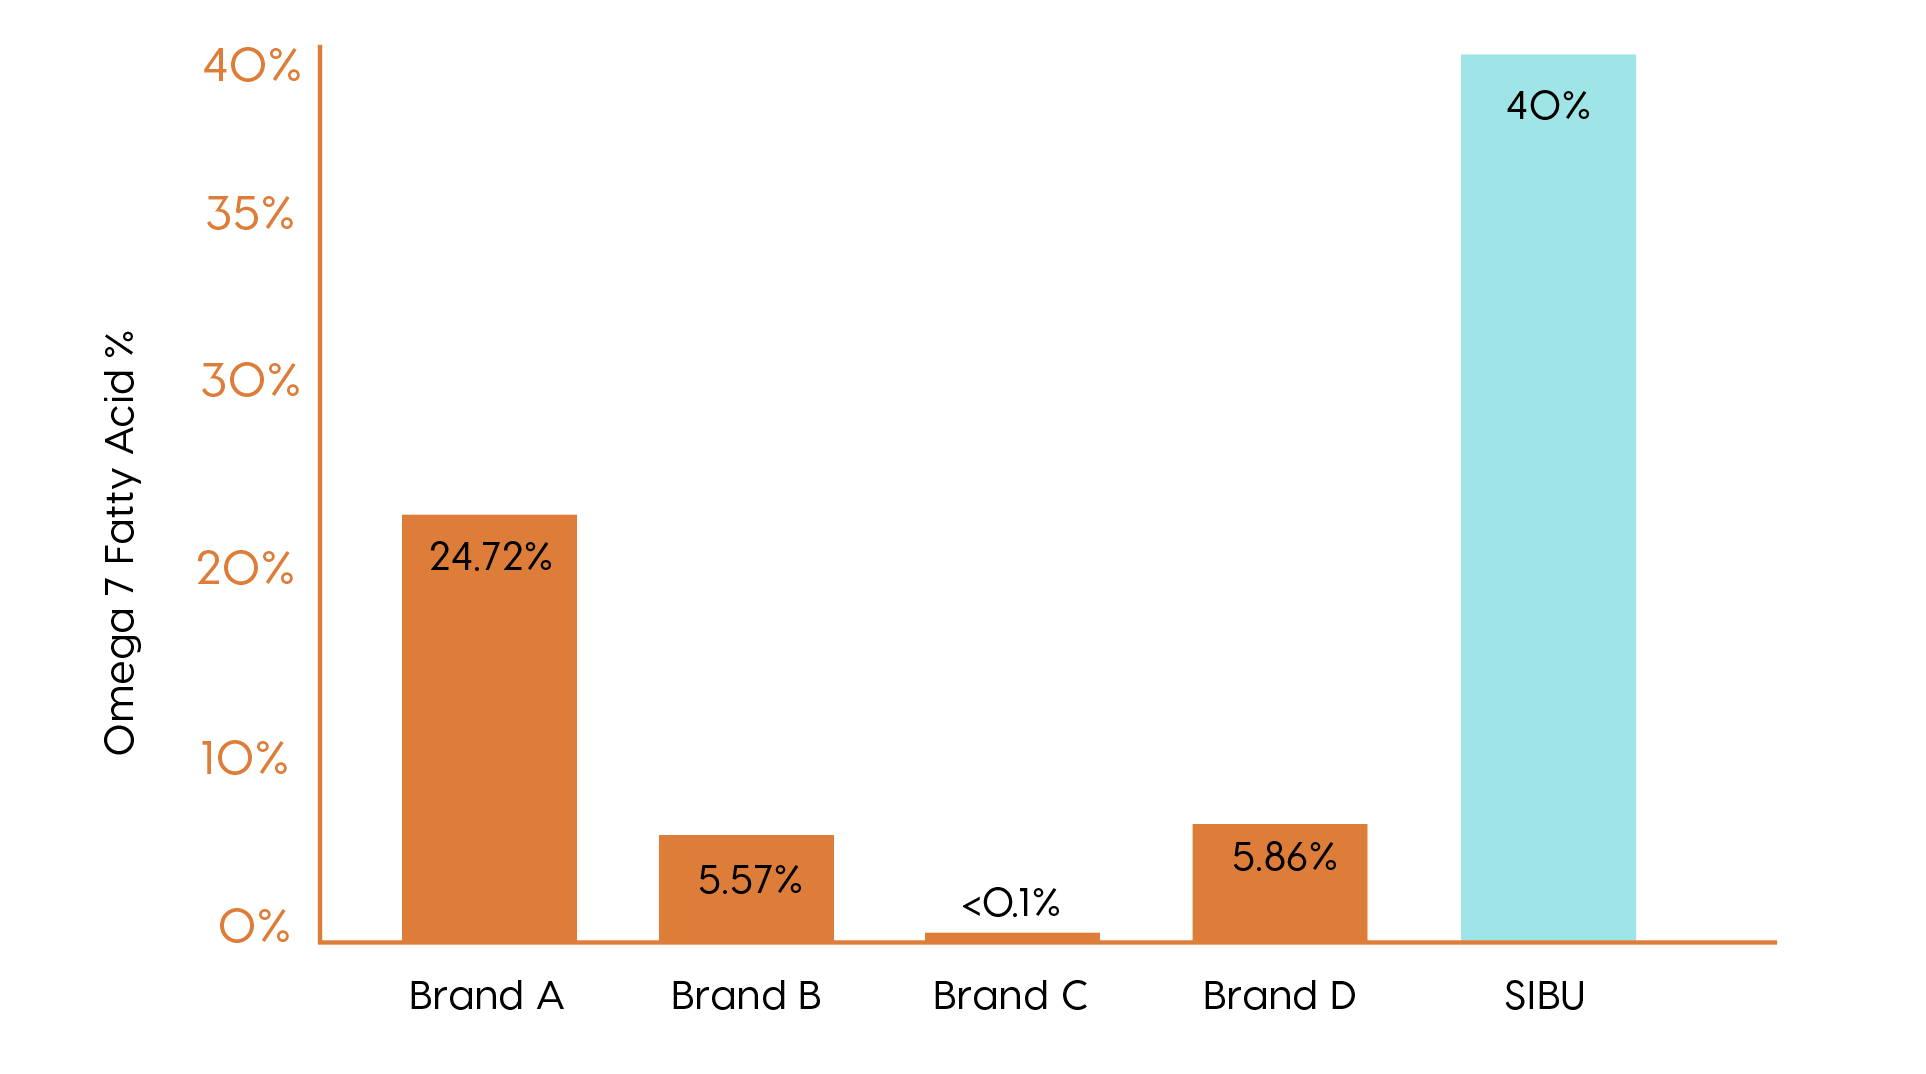 Sibu Omega 7 Fatty Acid percentage graph vs other brands